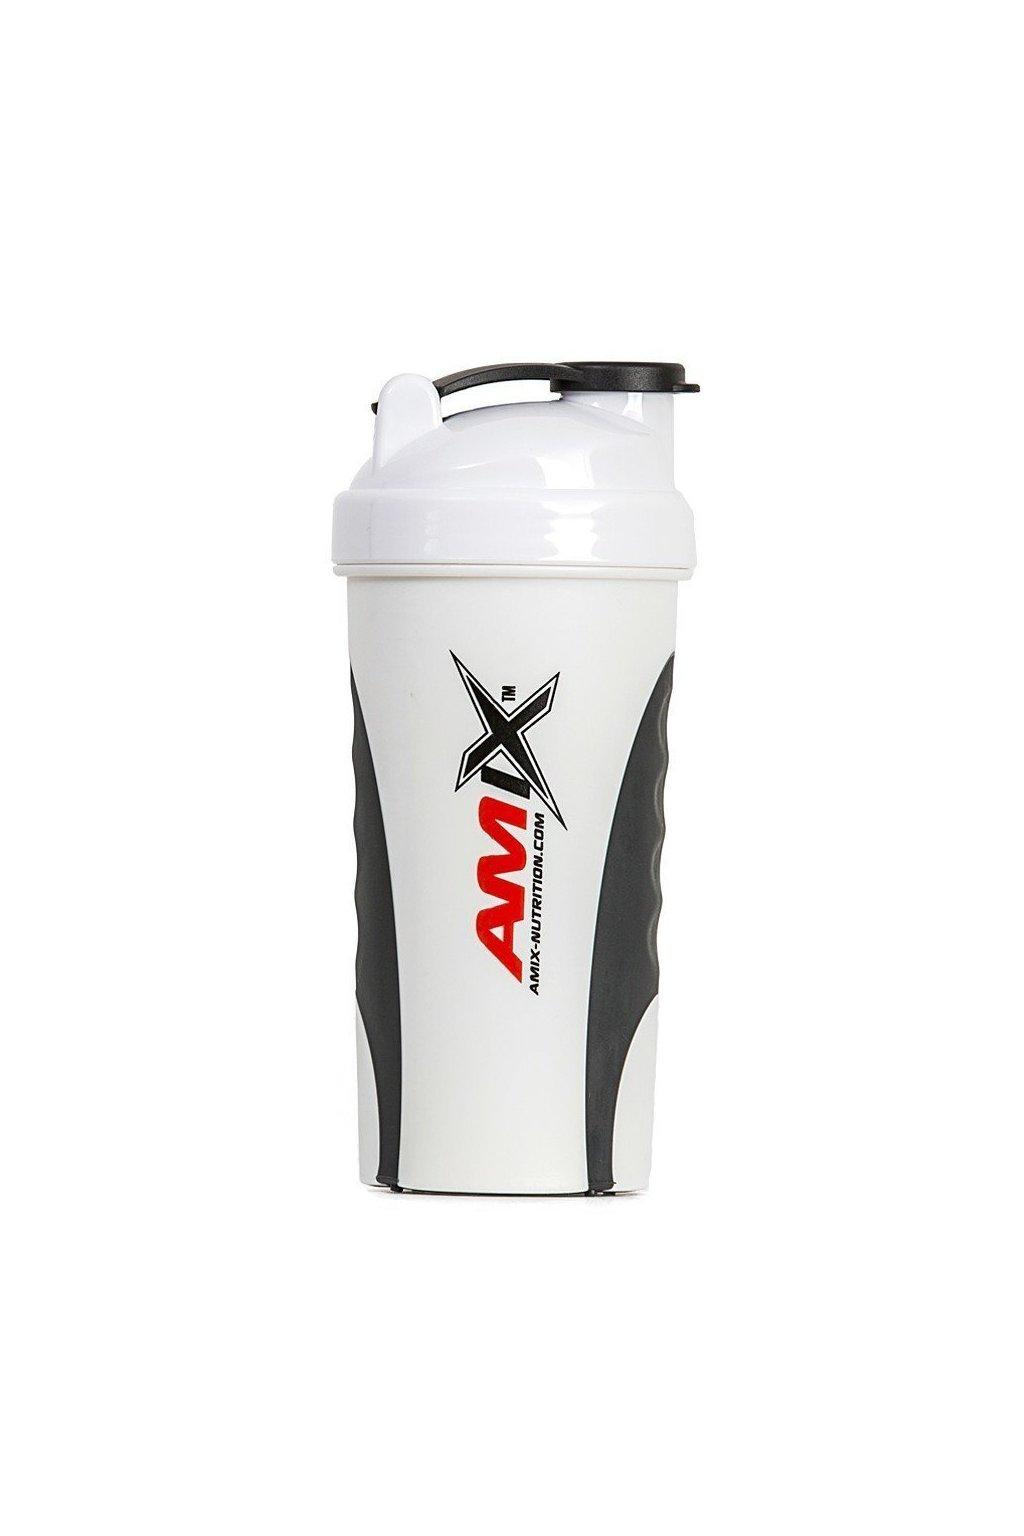 AX 00253 white 1